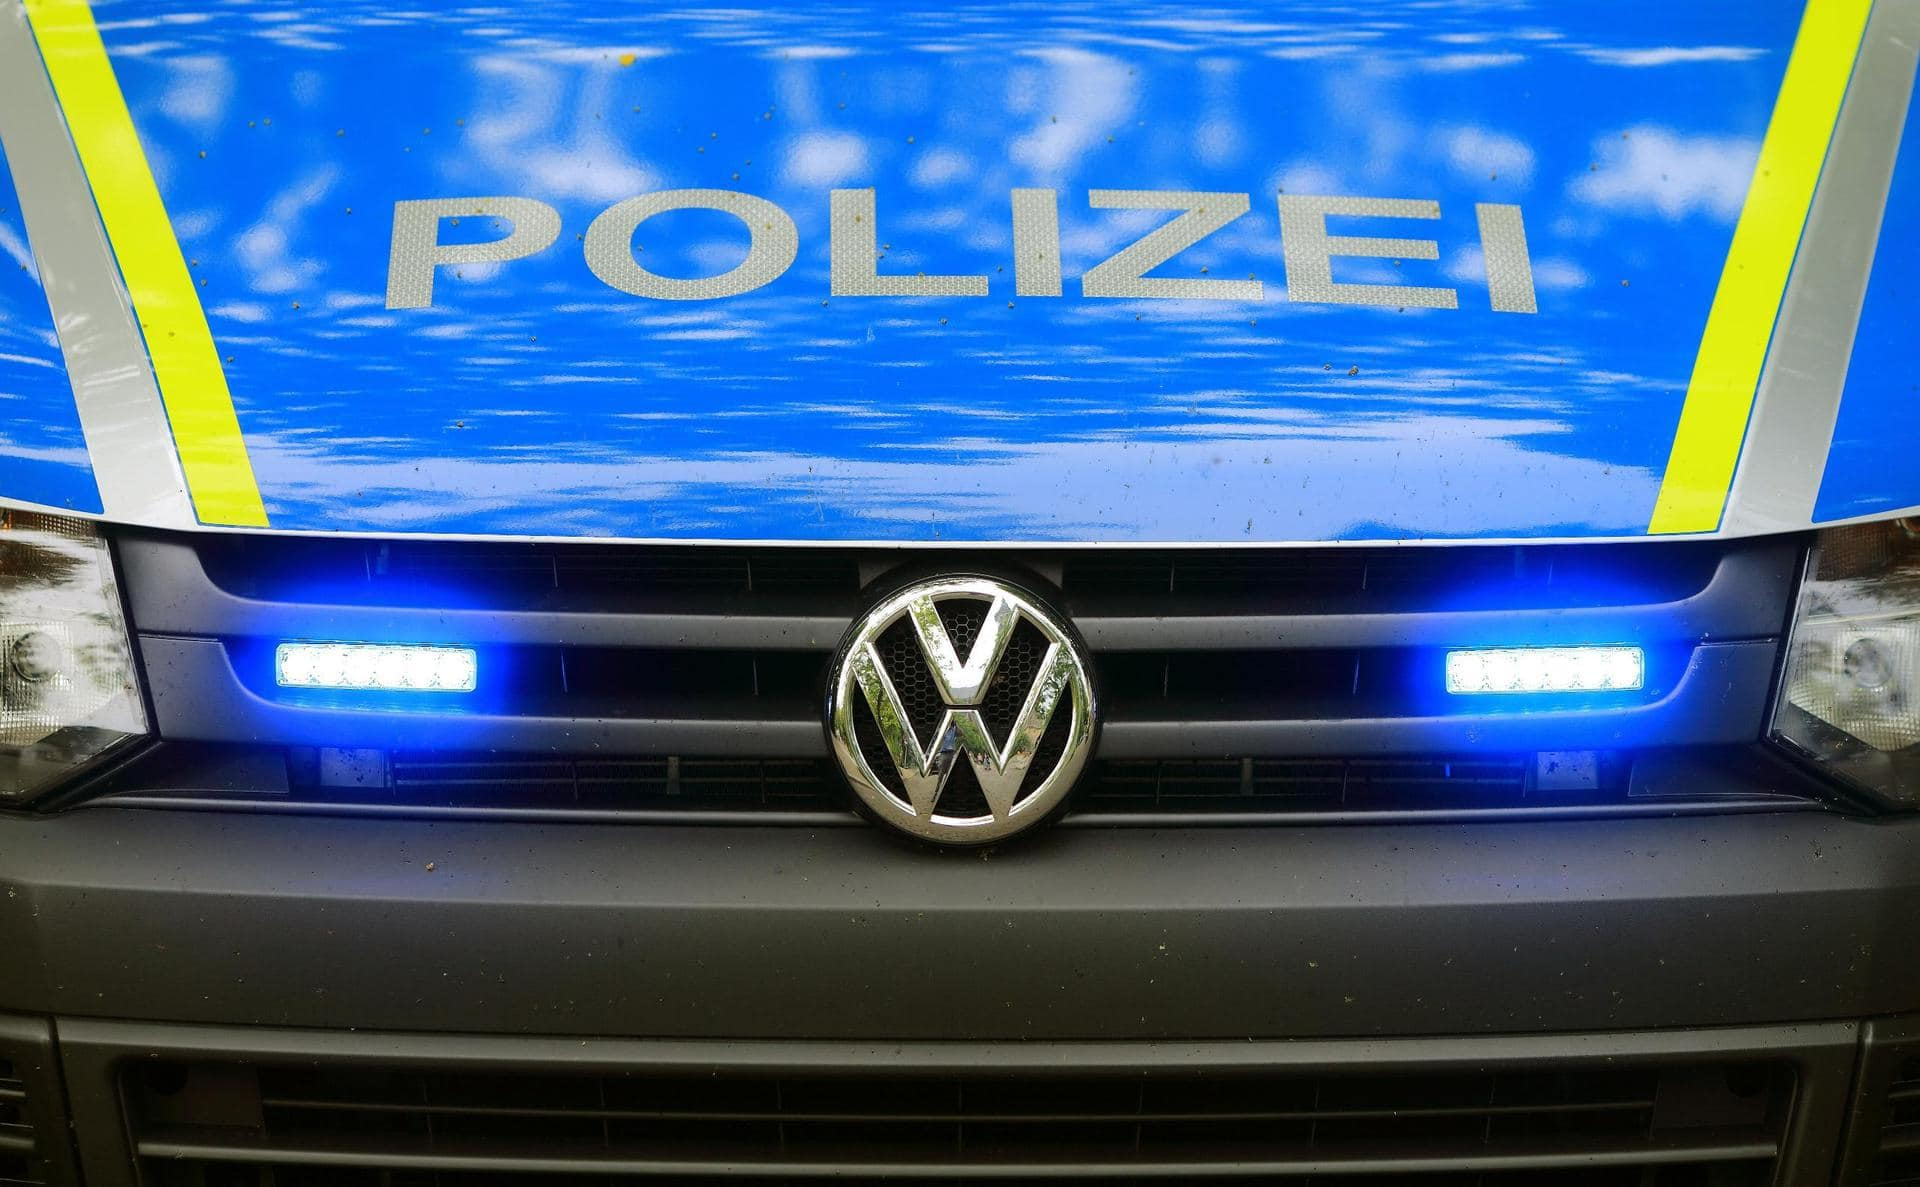 Mann springt aus fahrendem Auto Verfolgungsjagd mit Polizei